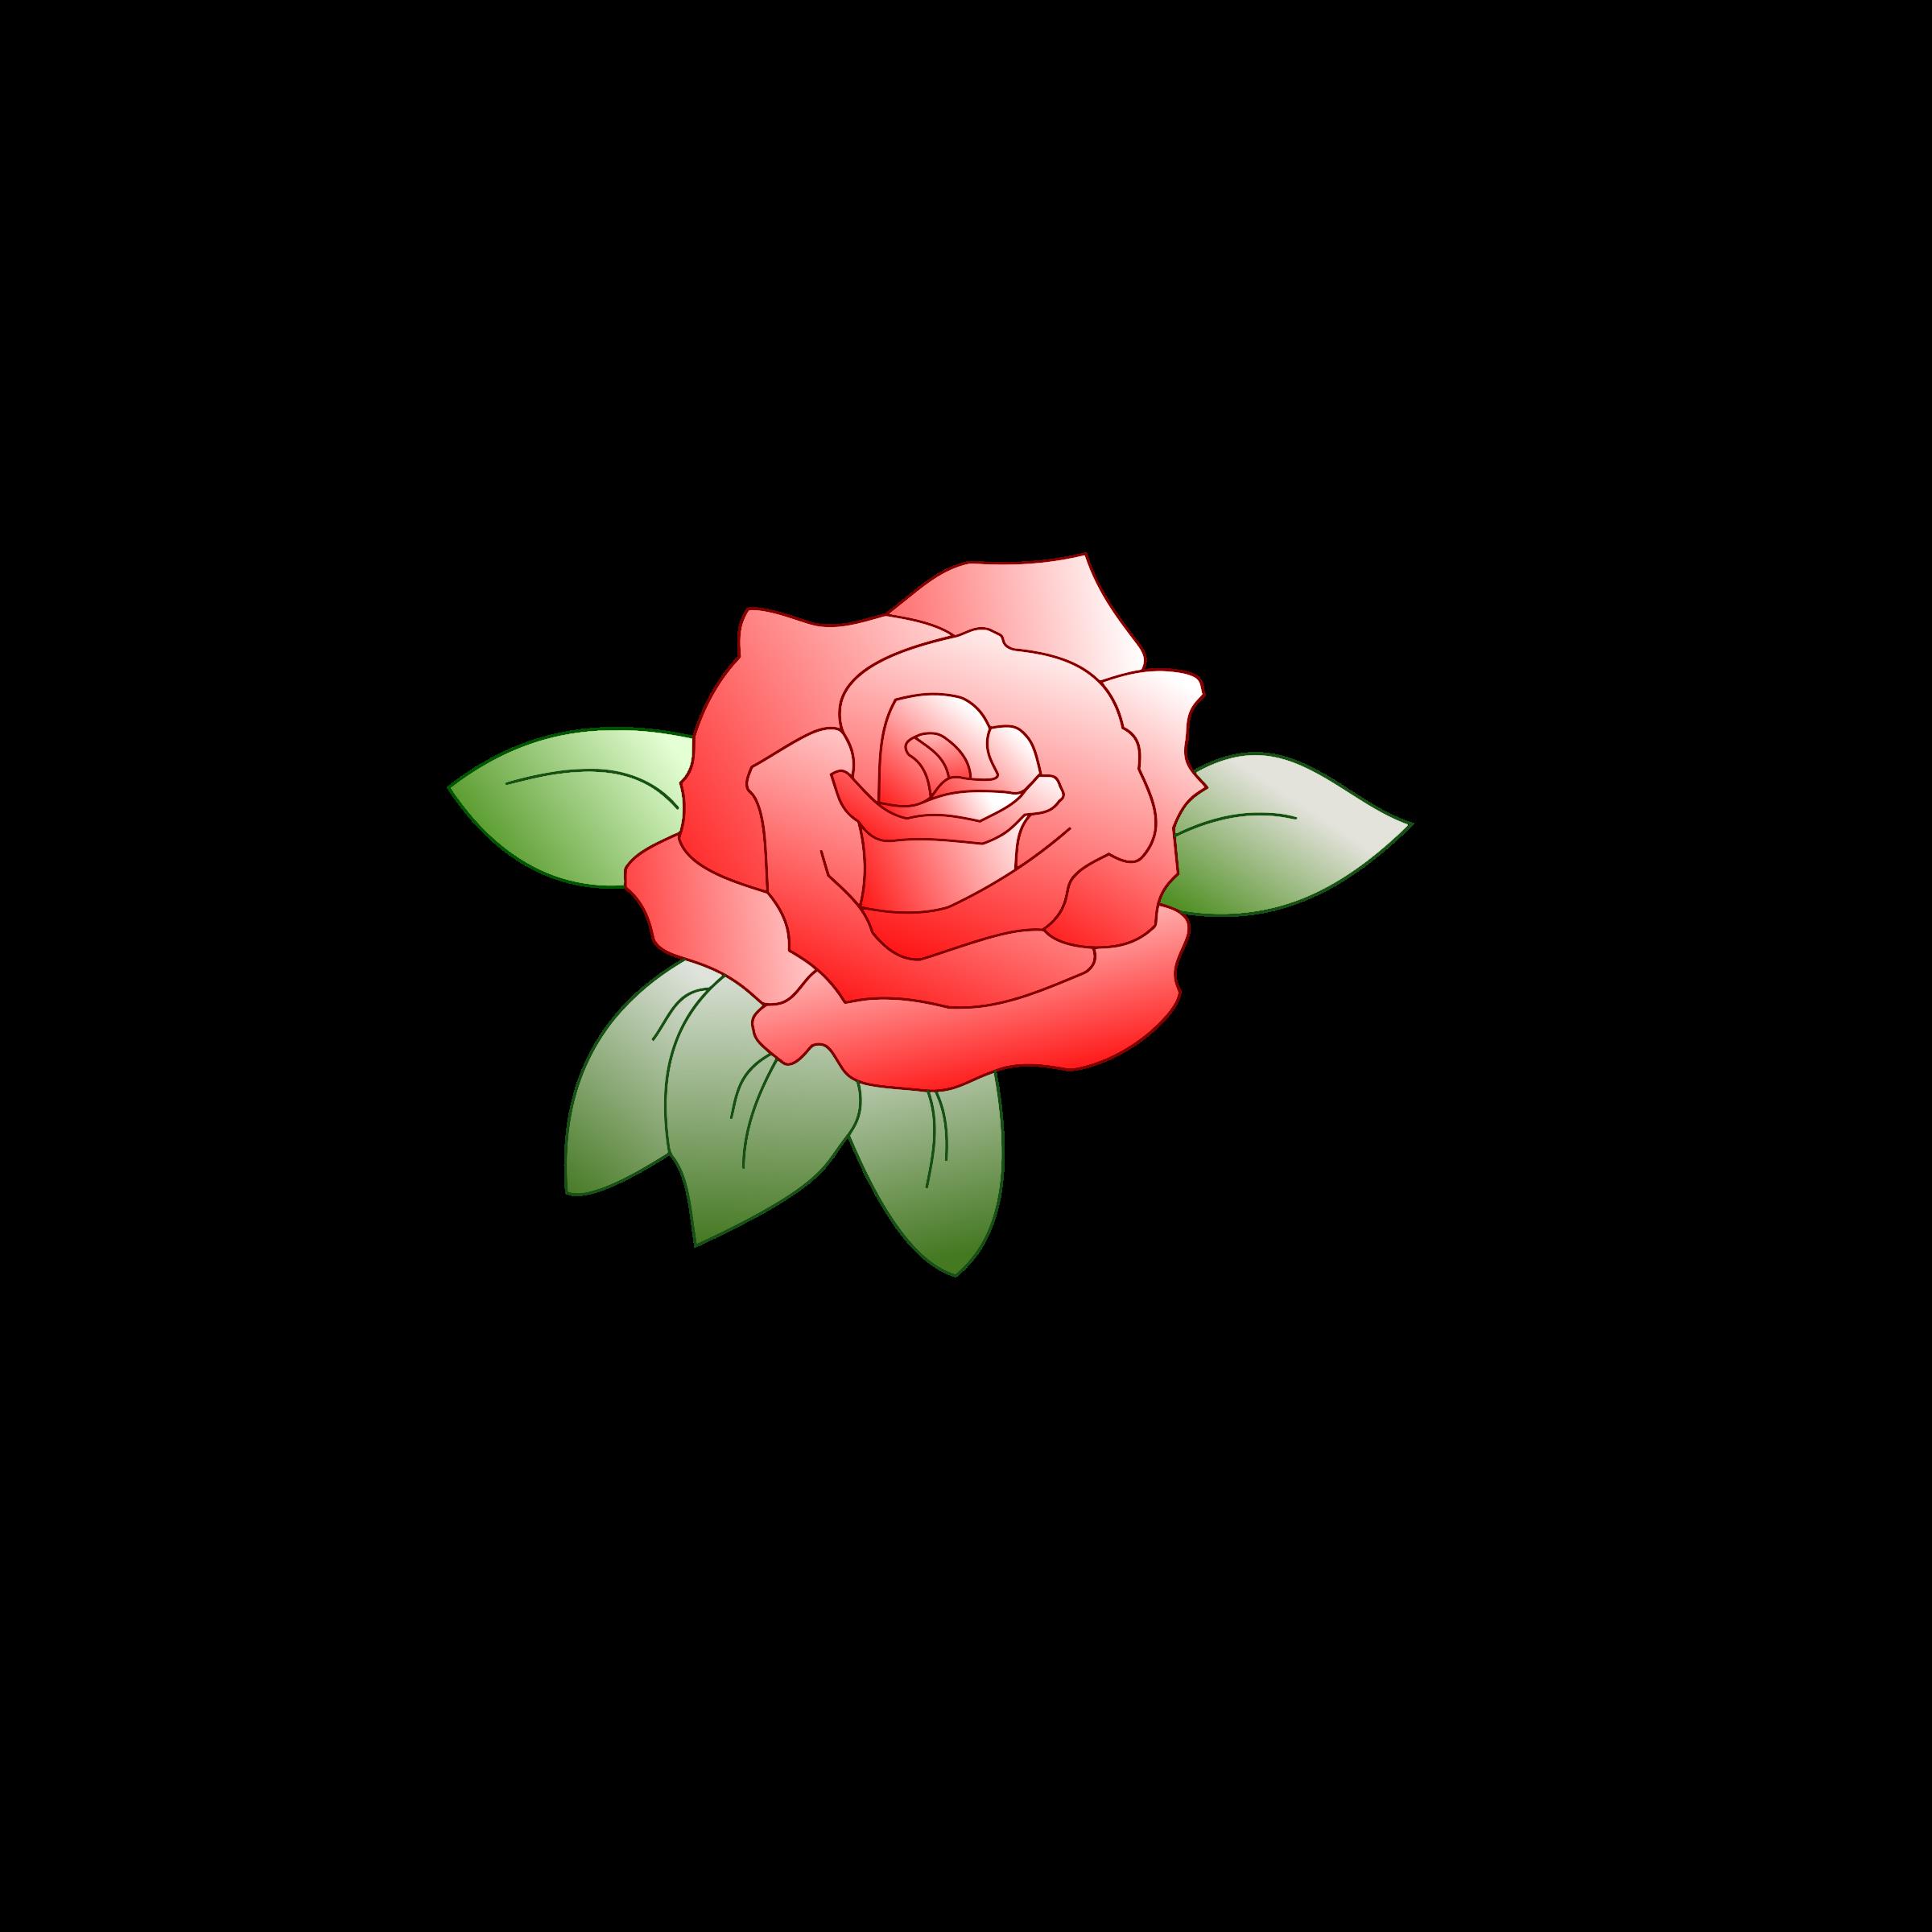 Rose clipart clip art. Colored big image png